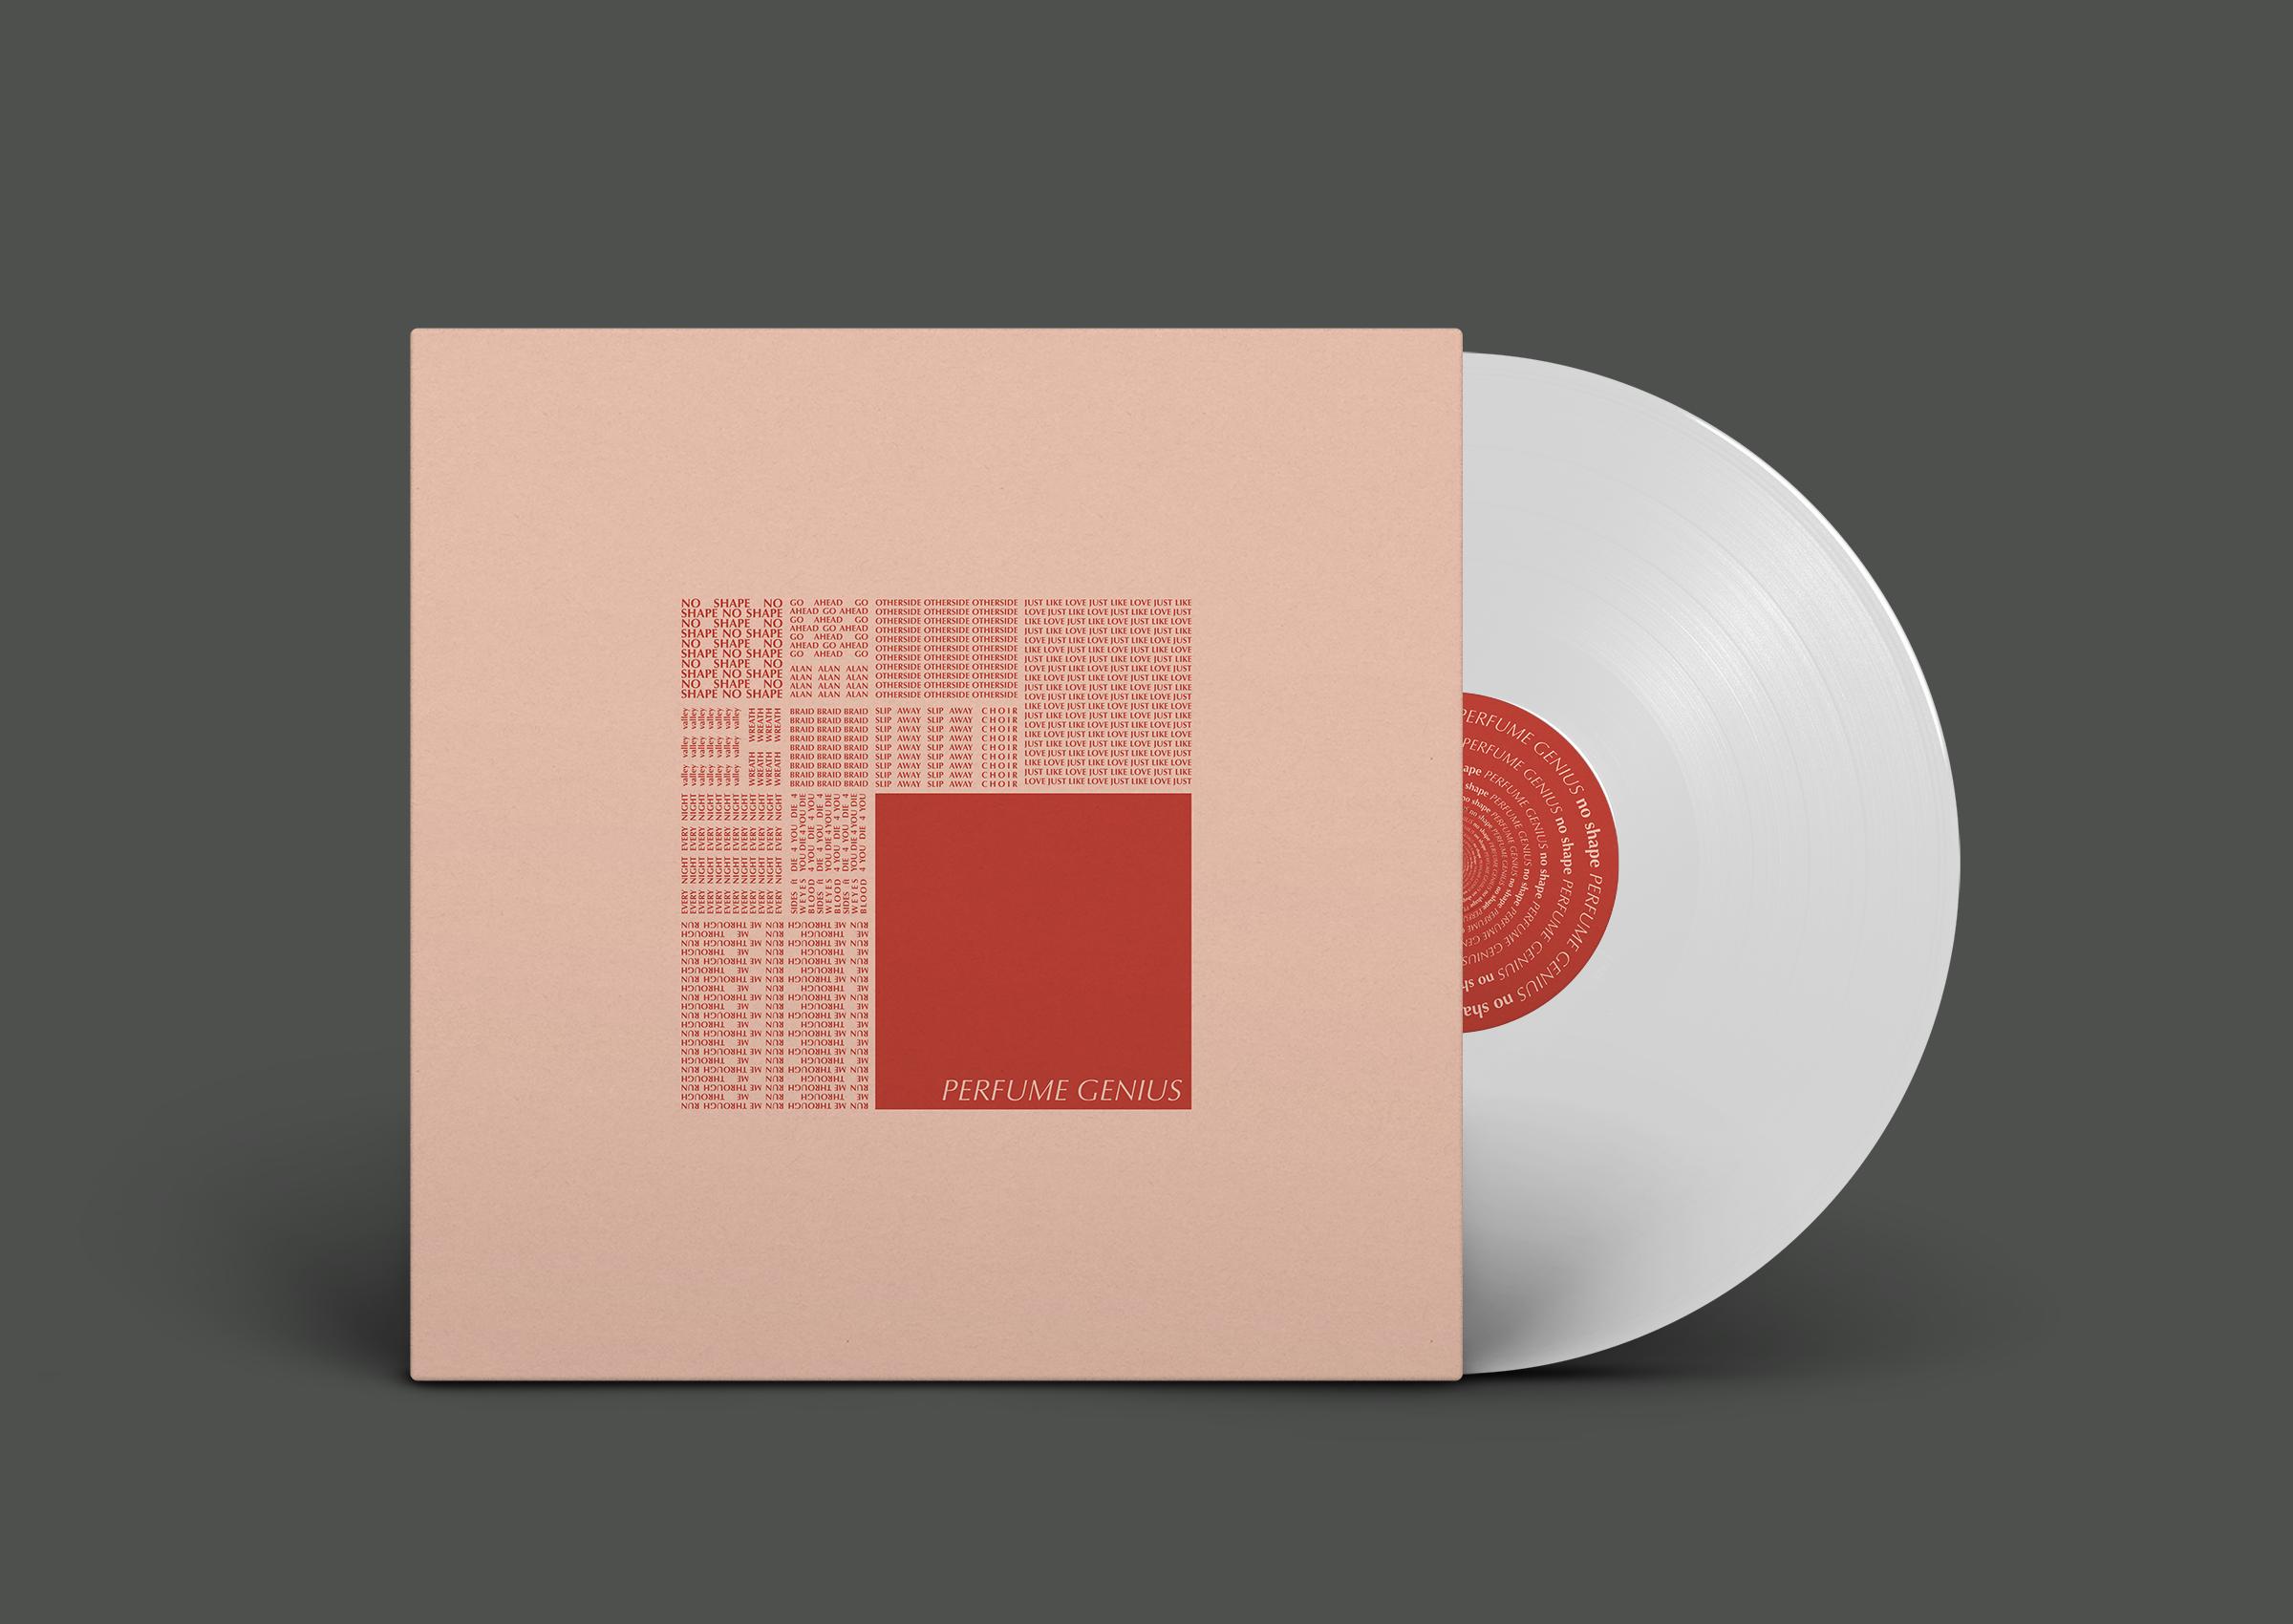 Perfume-Genius-Record.png